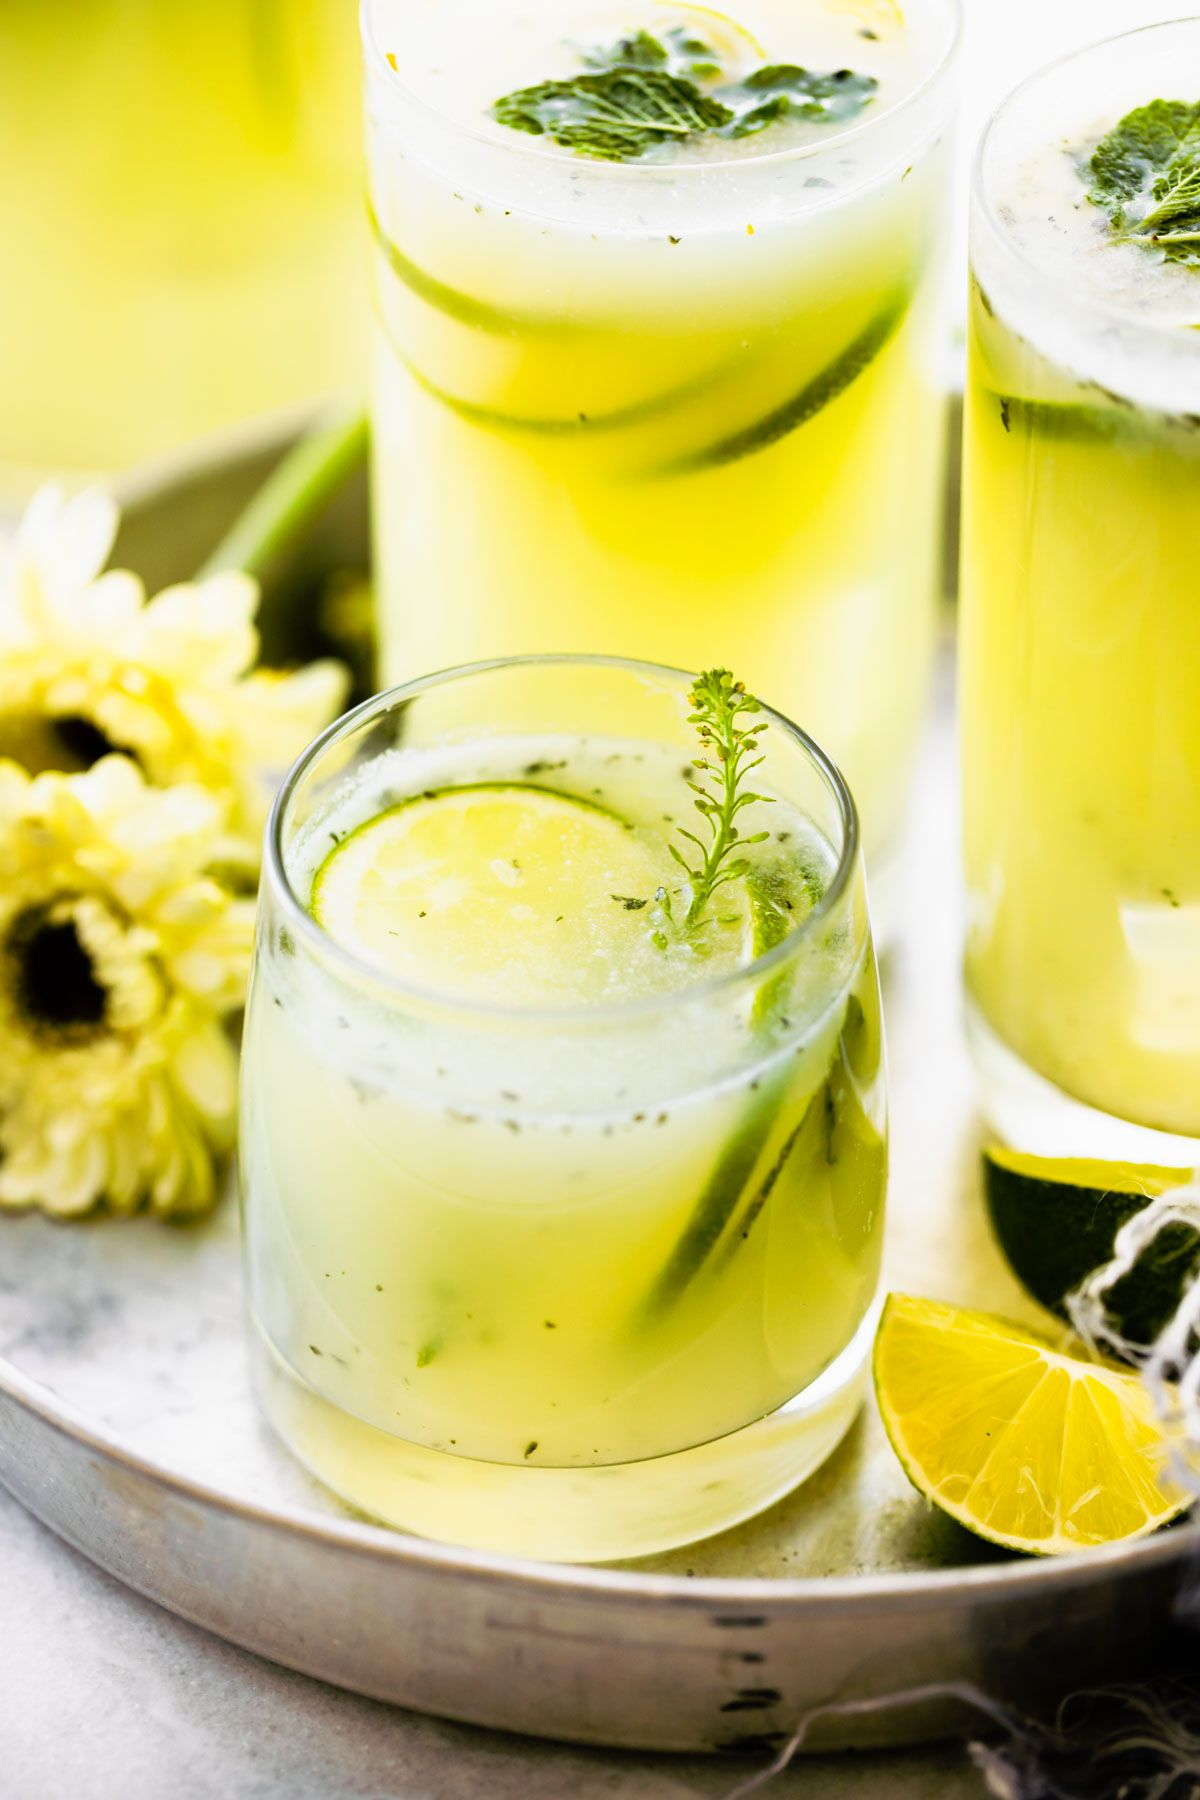 Brazilian Limeade Lemonade No Refined Sugar Cotter Crunch In 2020 Brazilian Lemonade Vegan Sweetened Condensed Milk Lemonade Recipes